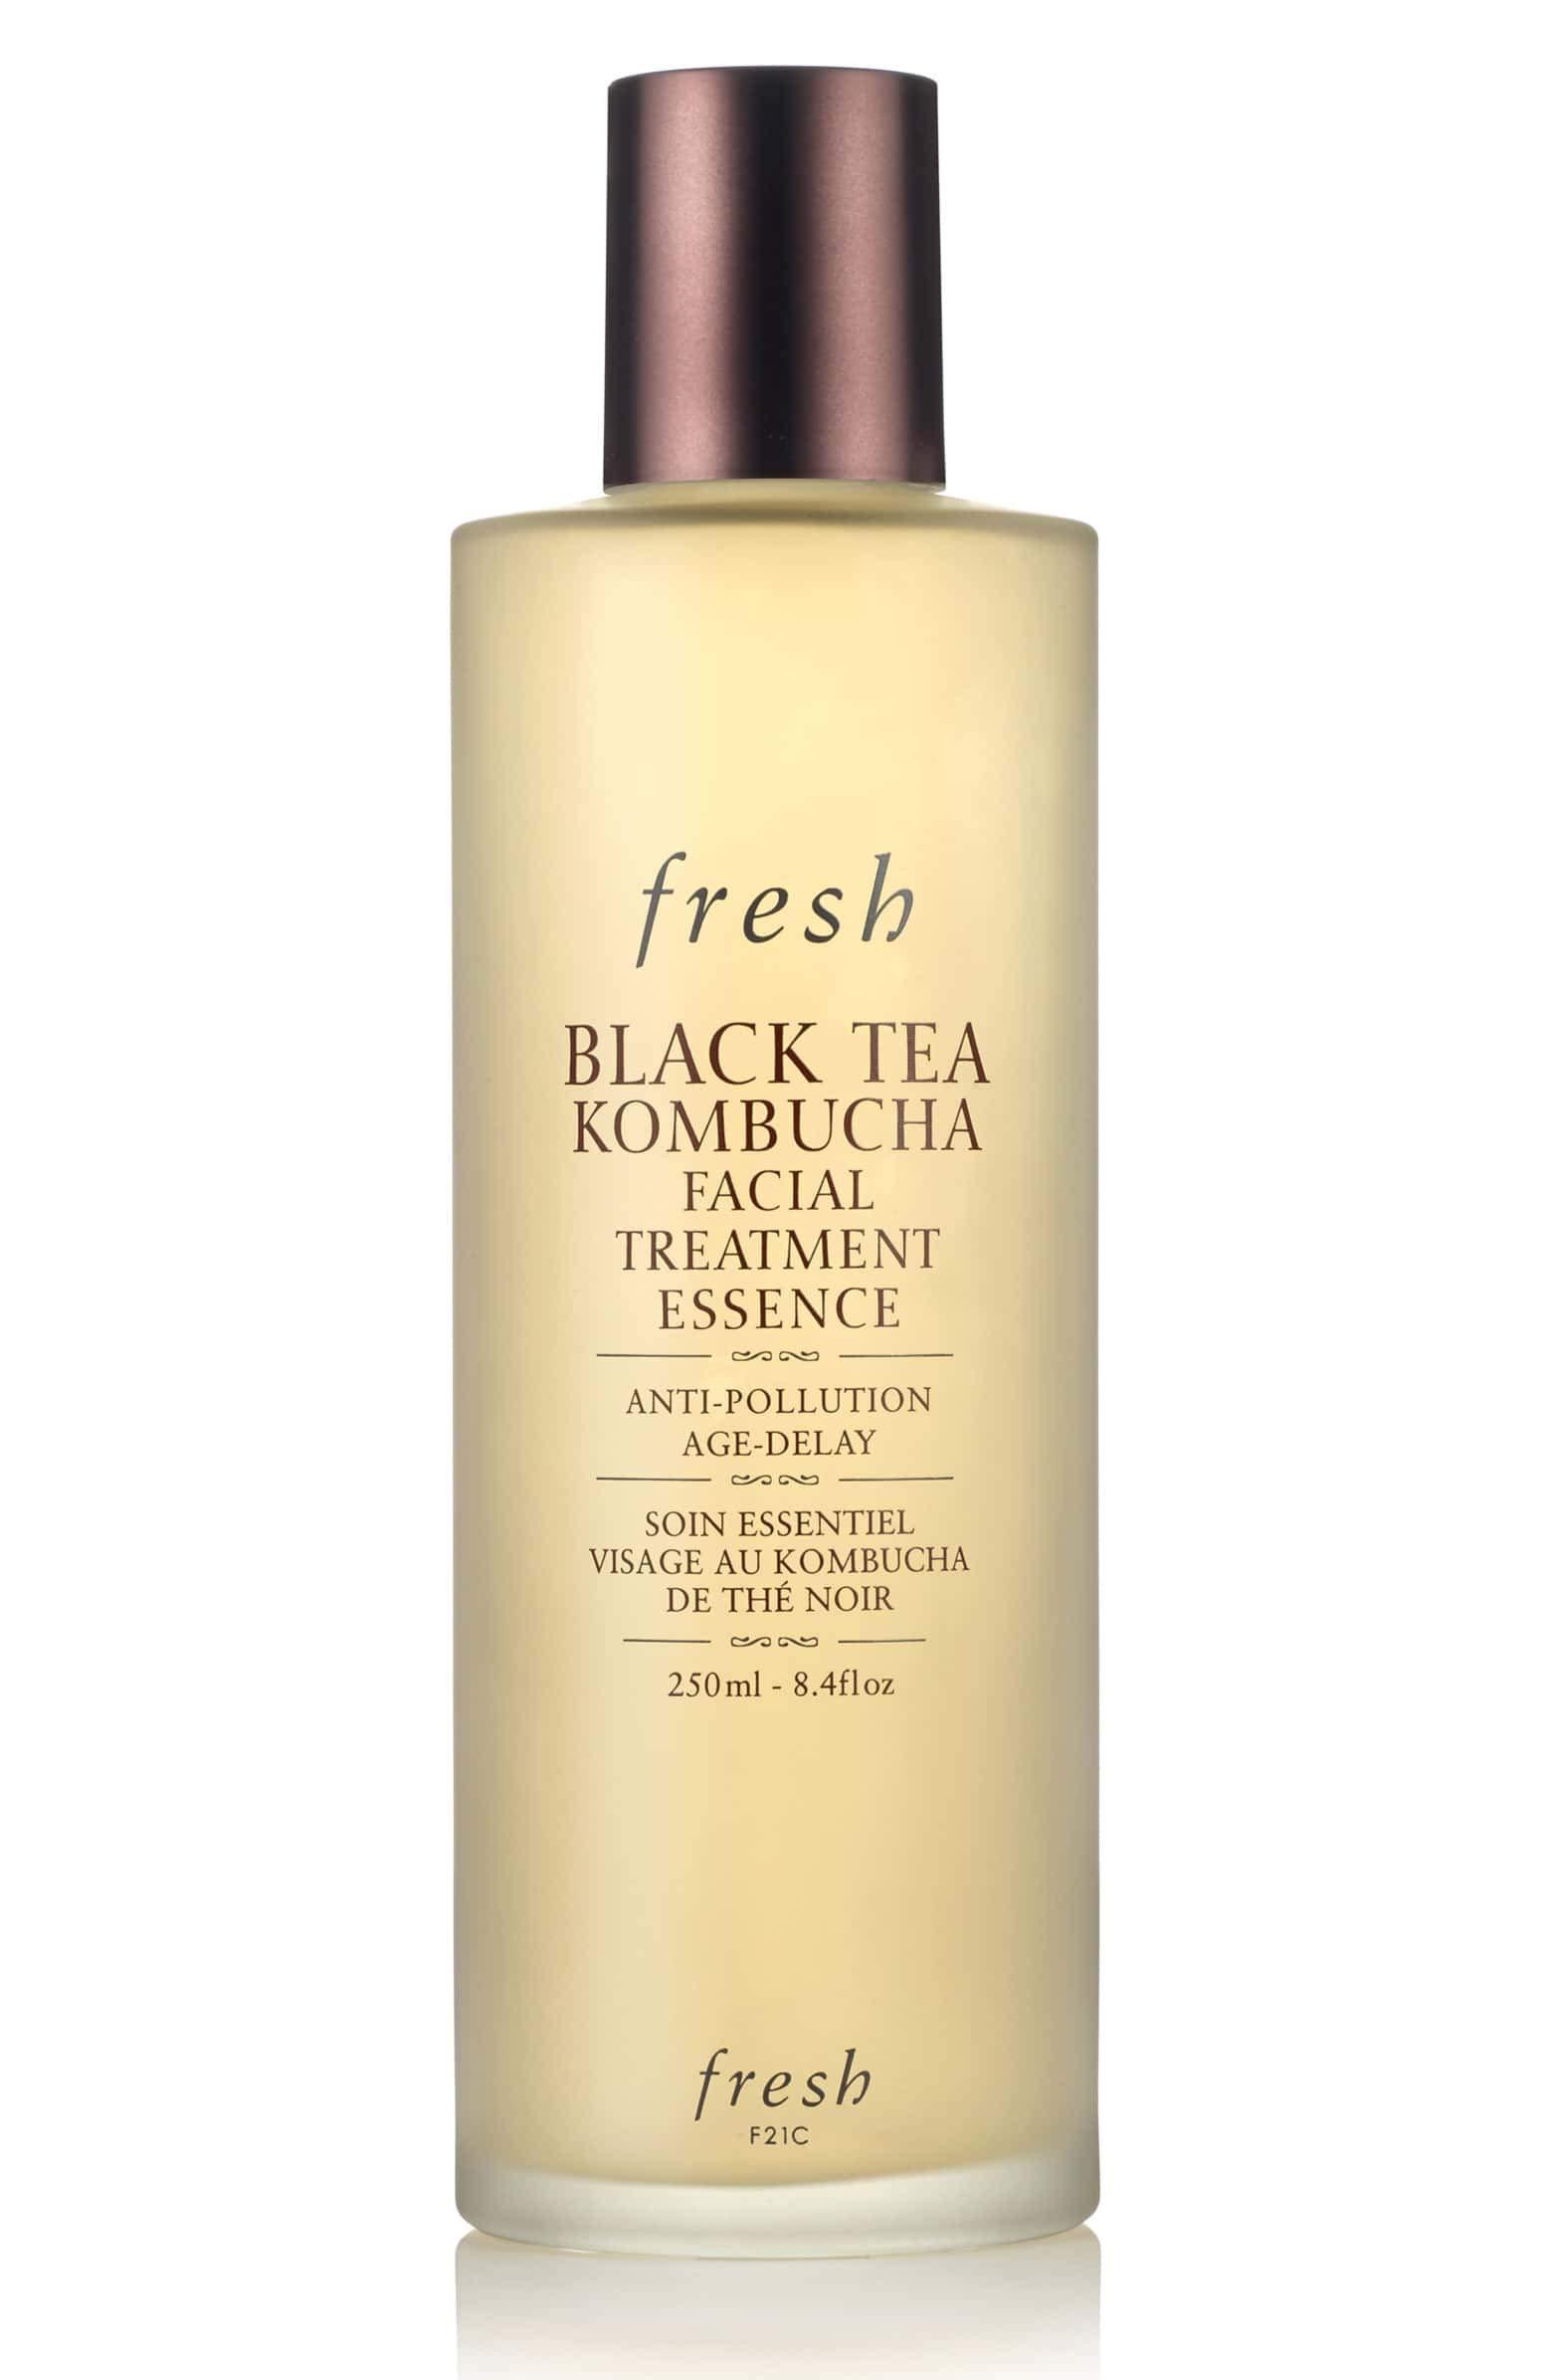 Fresh Black Tea Kombucha Facial Treatment Essence Anti-Pollutioin Age-Delay 8.4oz/250ml